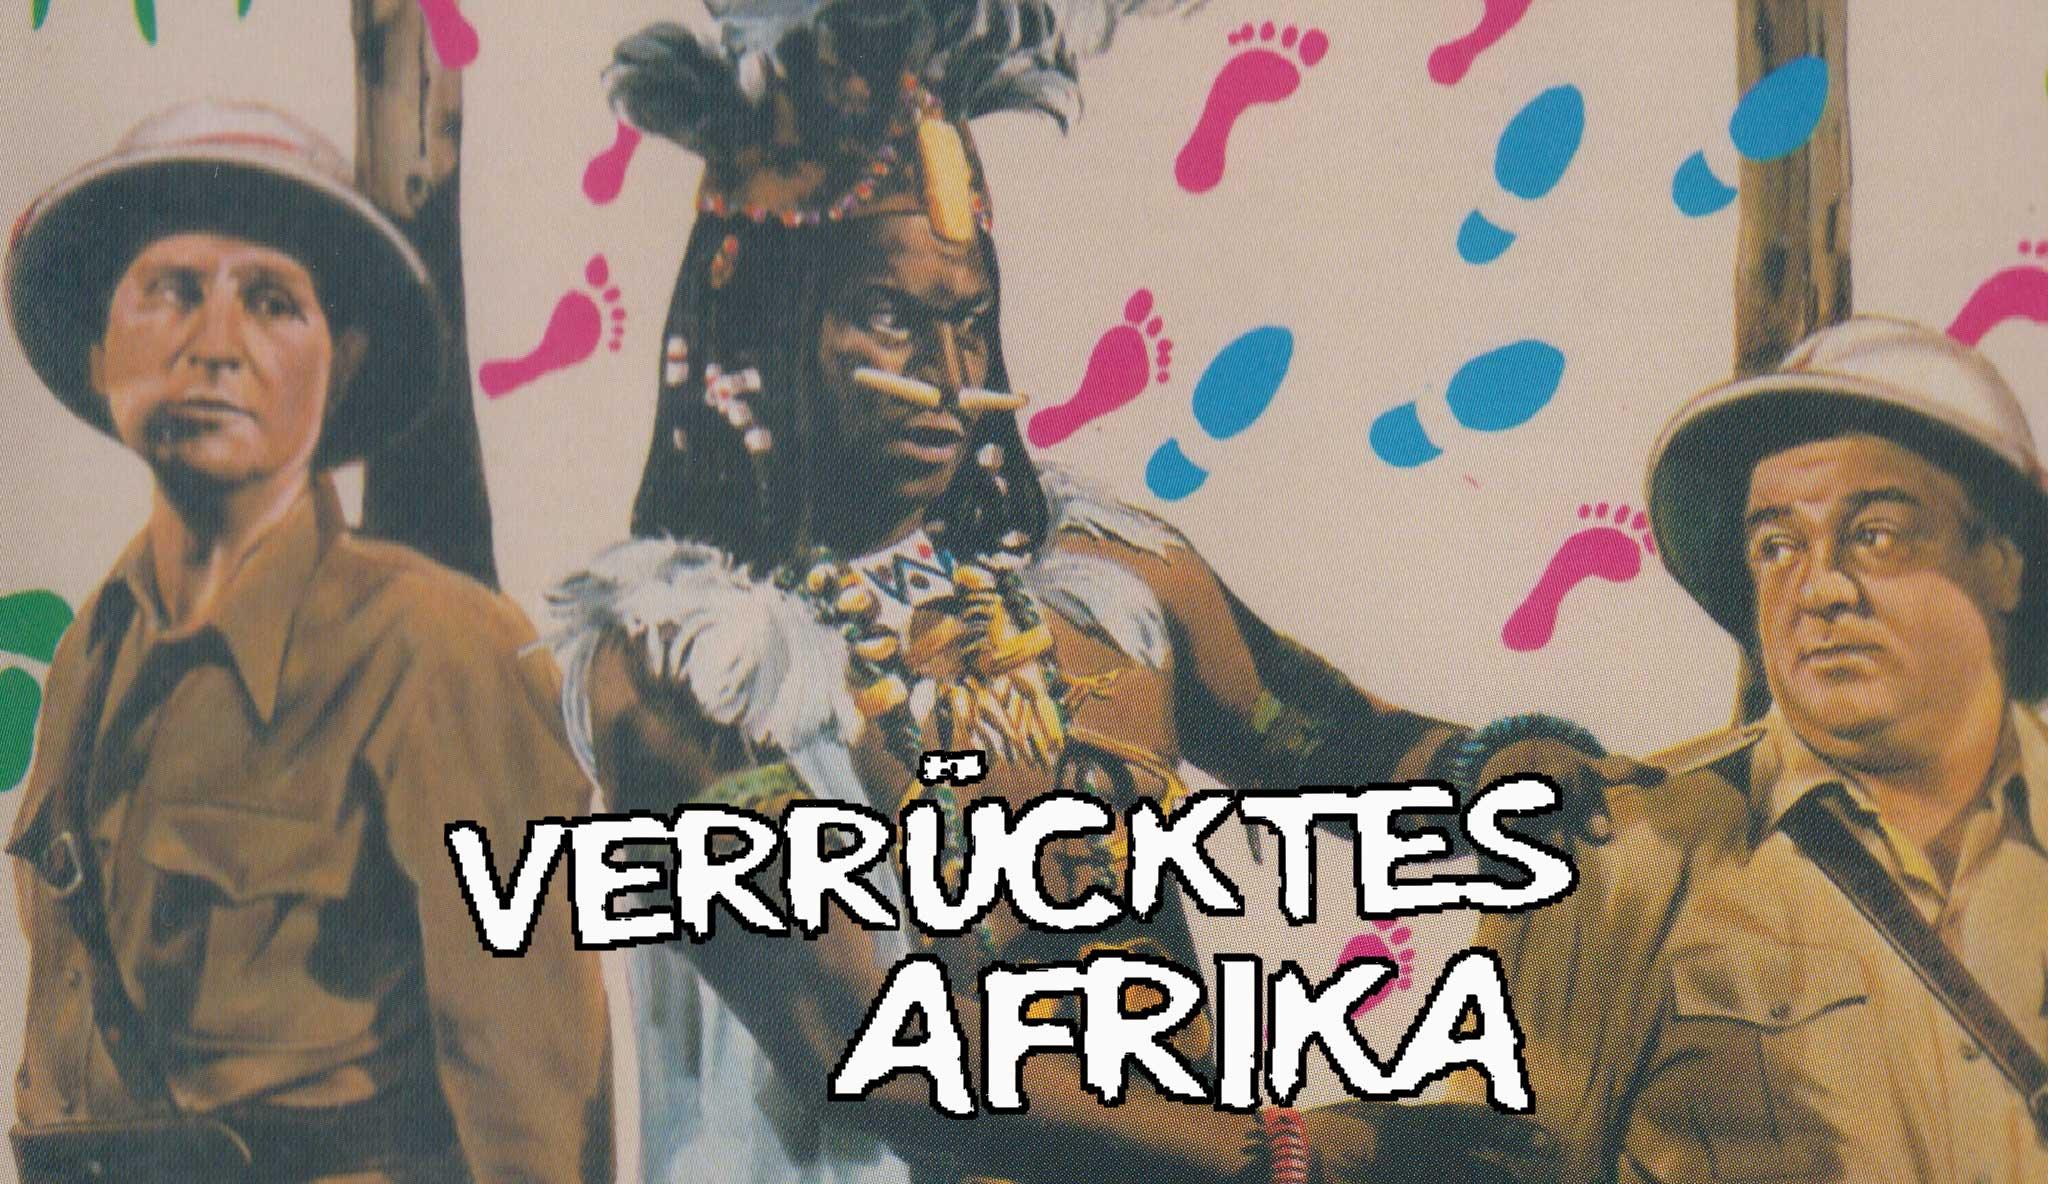 verrucktes-afrika\header.jpg